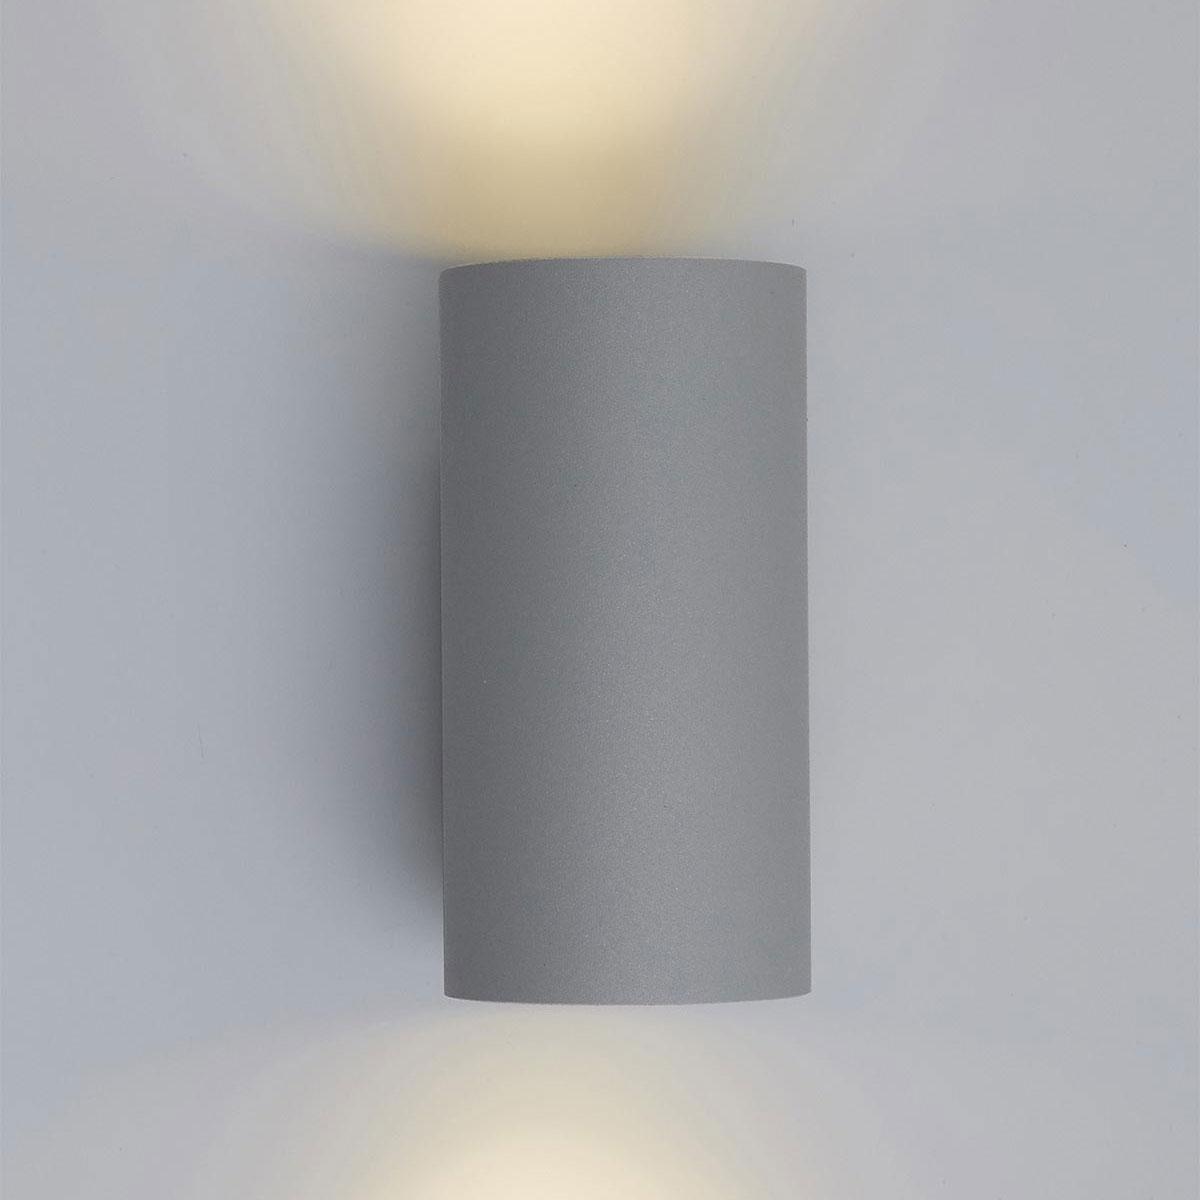 Dusk grey 00001 1200x1200